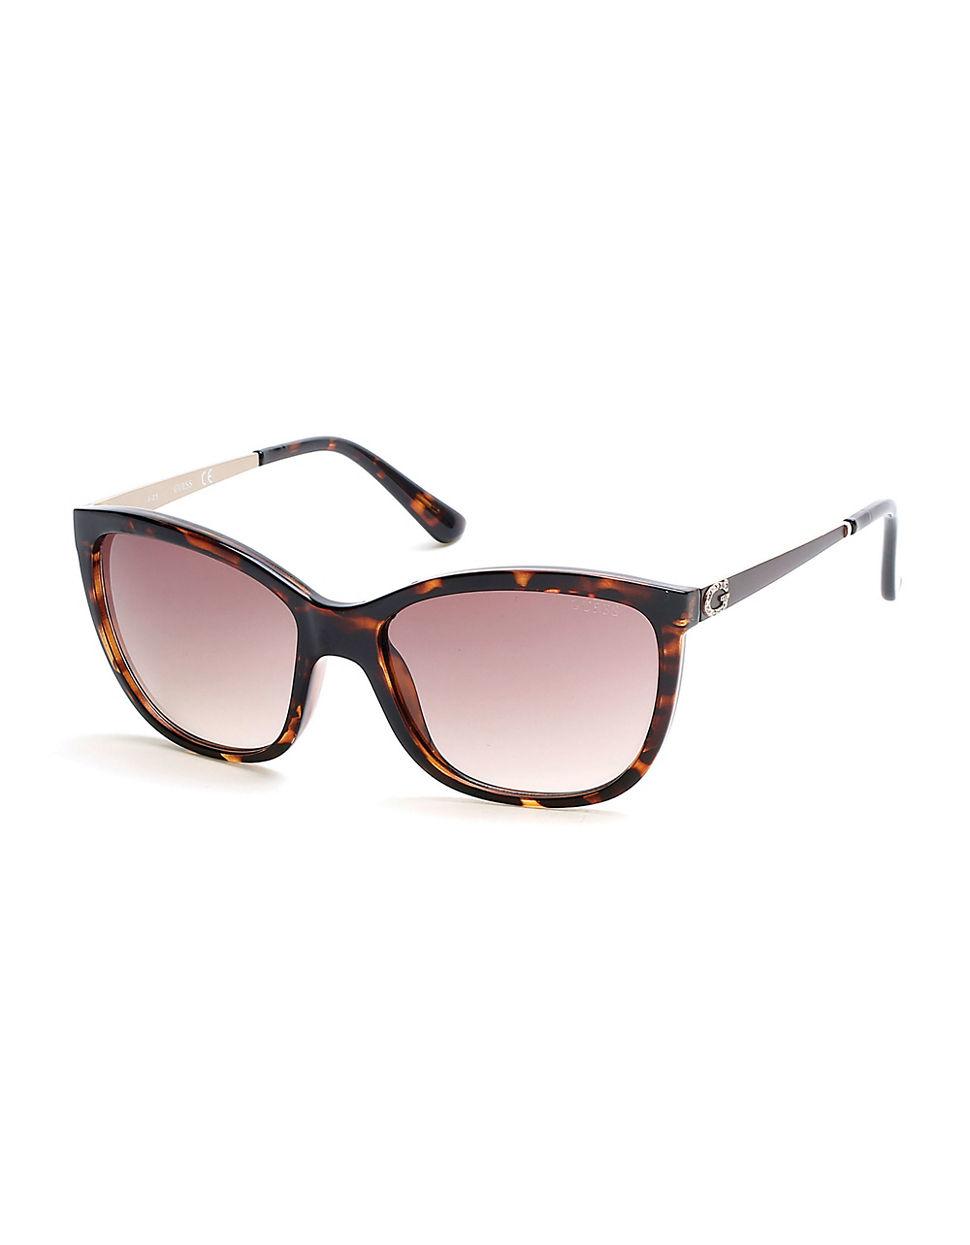 Square Shaped Aviator Sunglasses